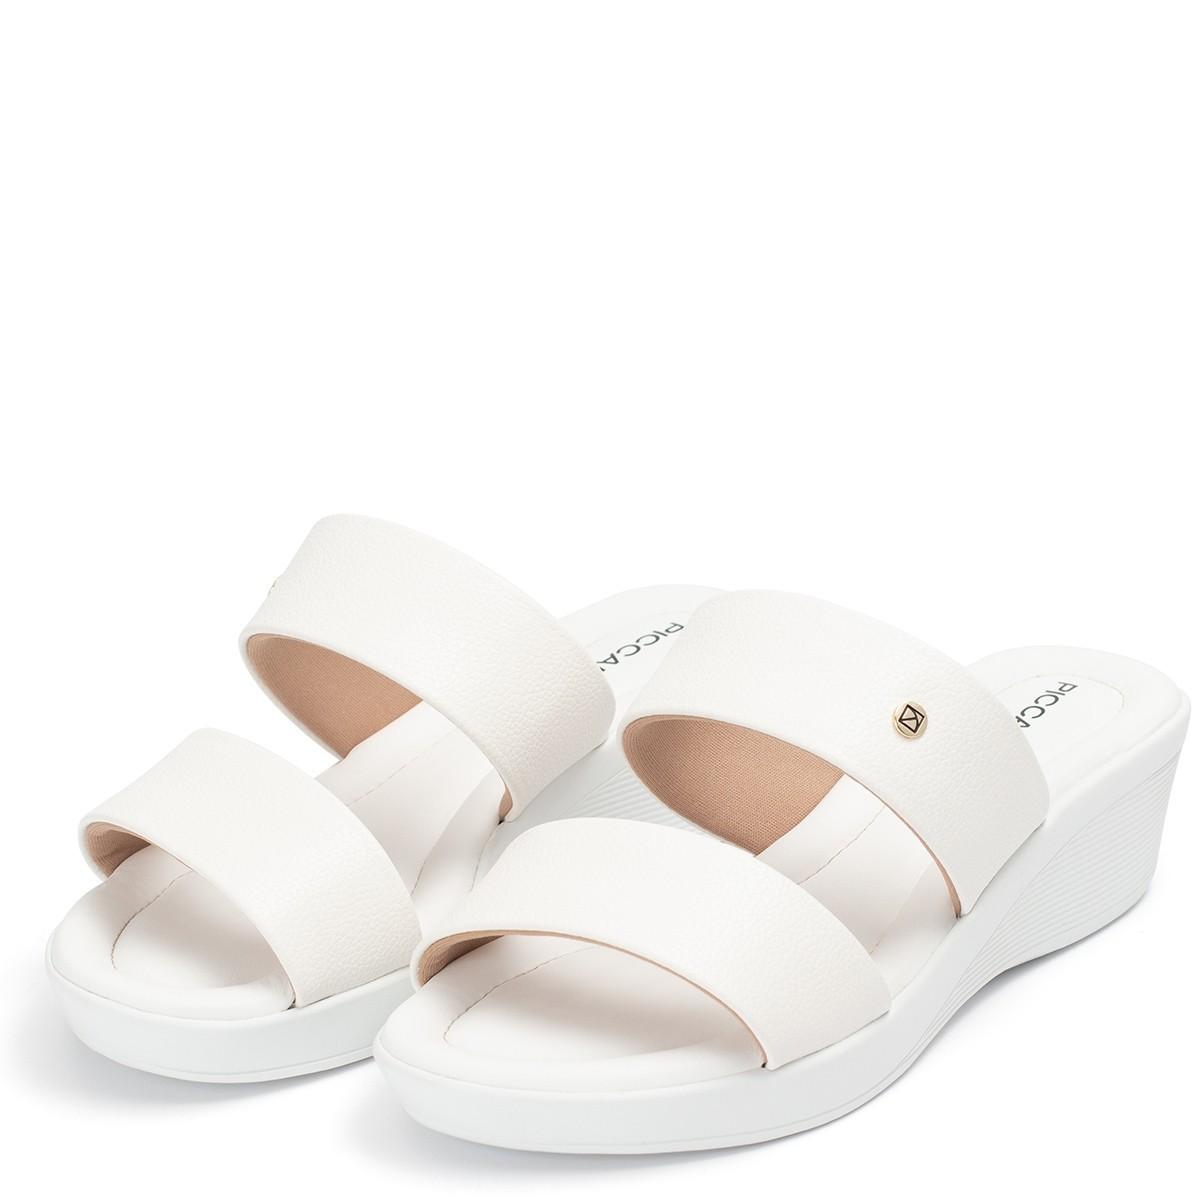 Tamanco Anabela Baixo Feminino Branco Piccadilly Conforto